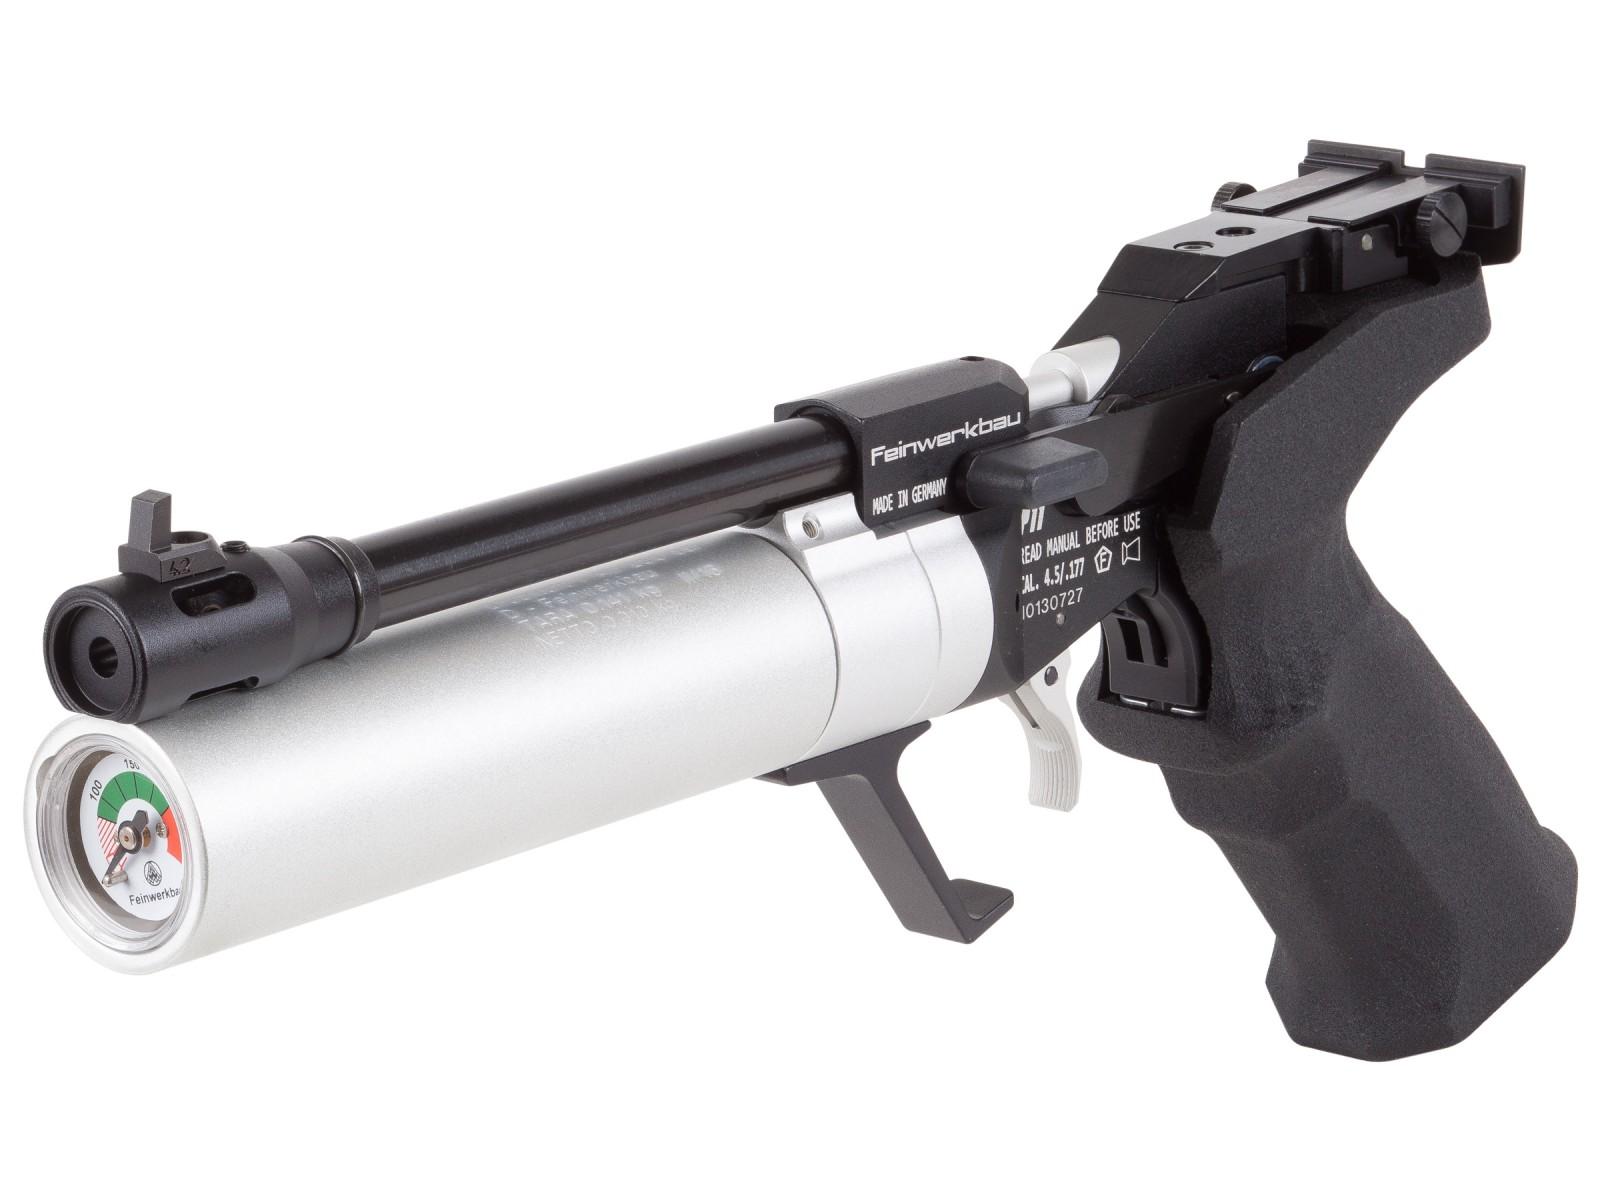 Feinwerkbau P11 Piccolo Air Pistol (Long)